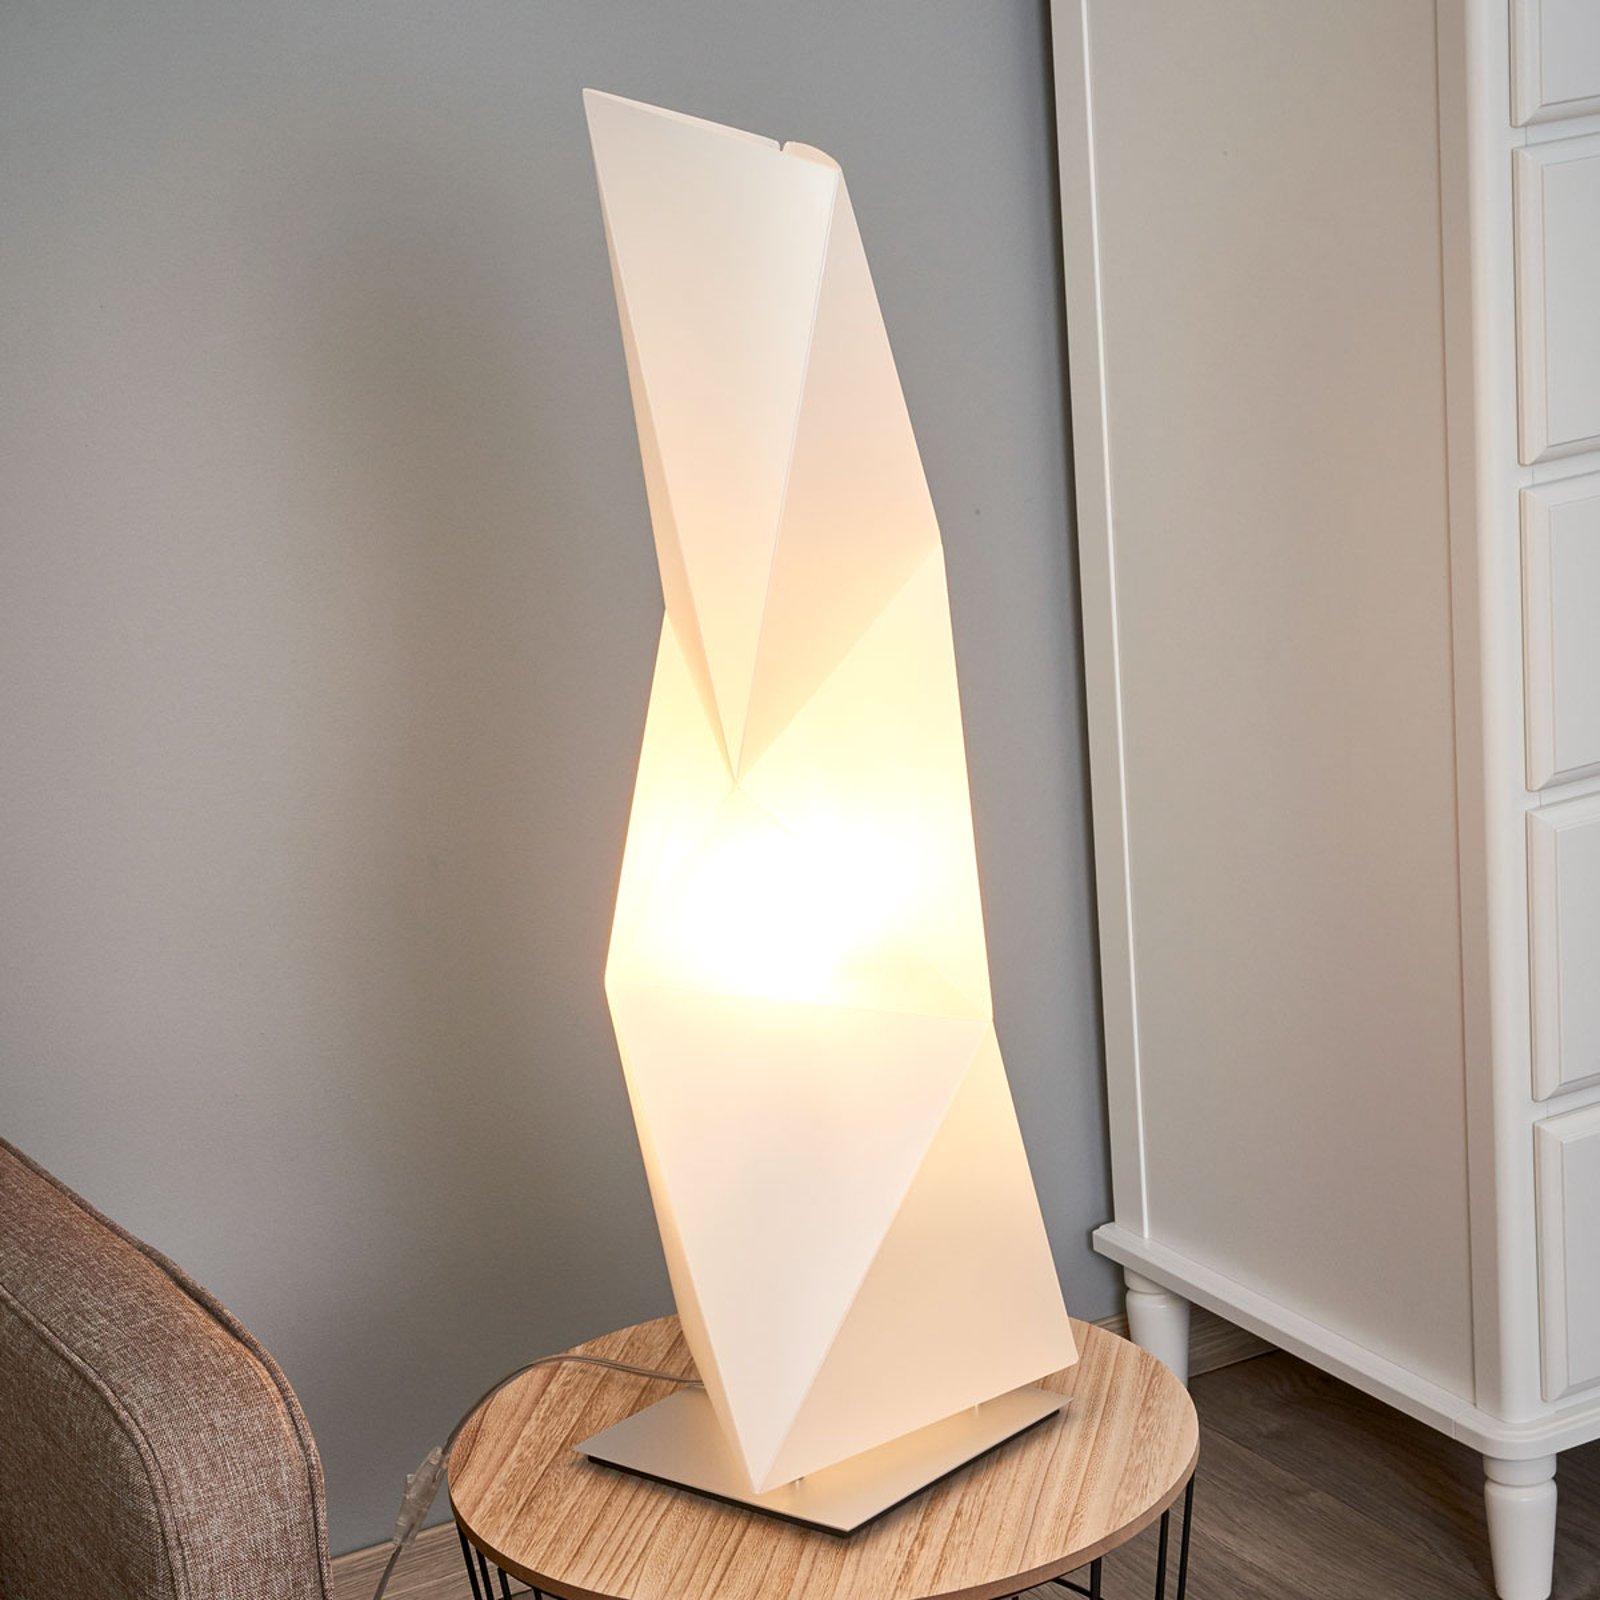 Kantet designer-bordlampe Diamond 72 cm